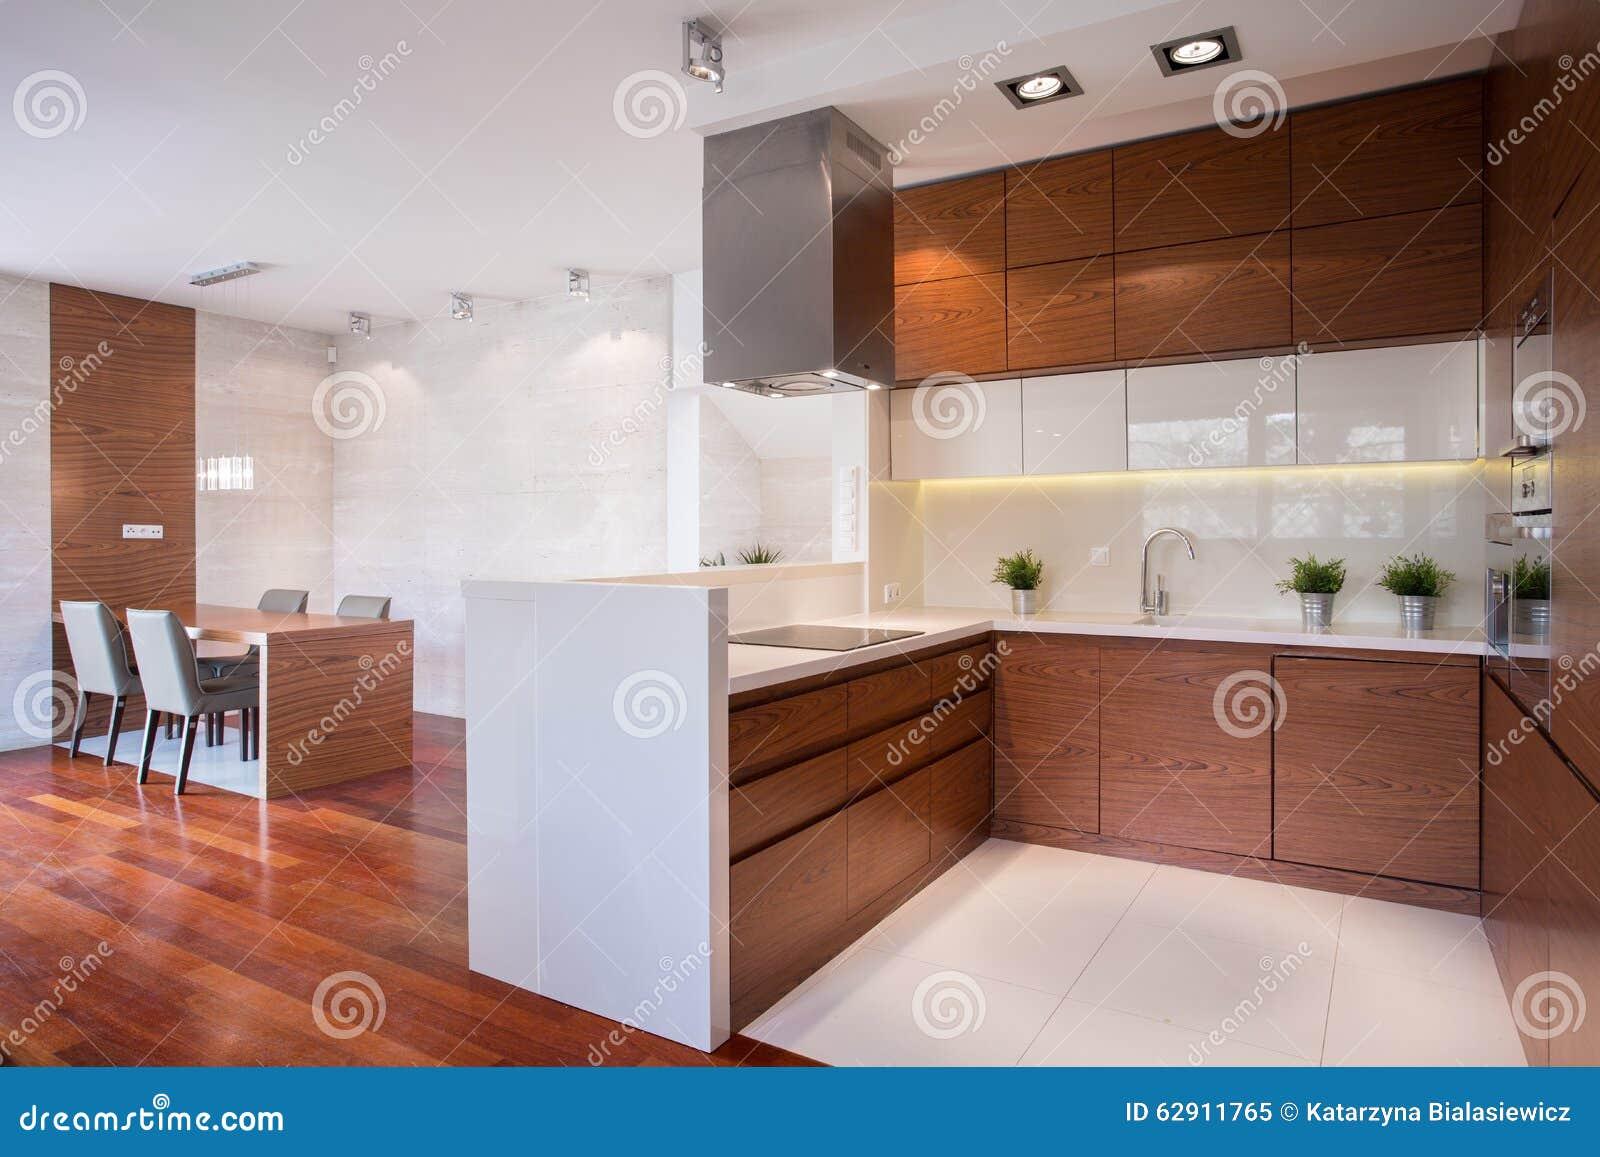 Cocina moderna en madera imagen de archivo Imagen de lujo 62911765